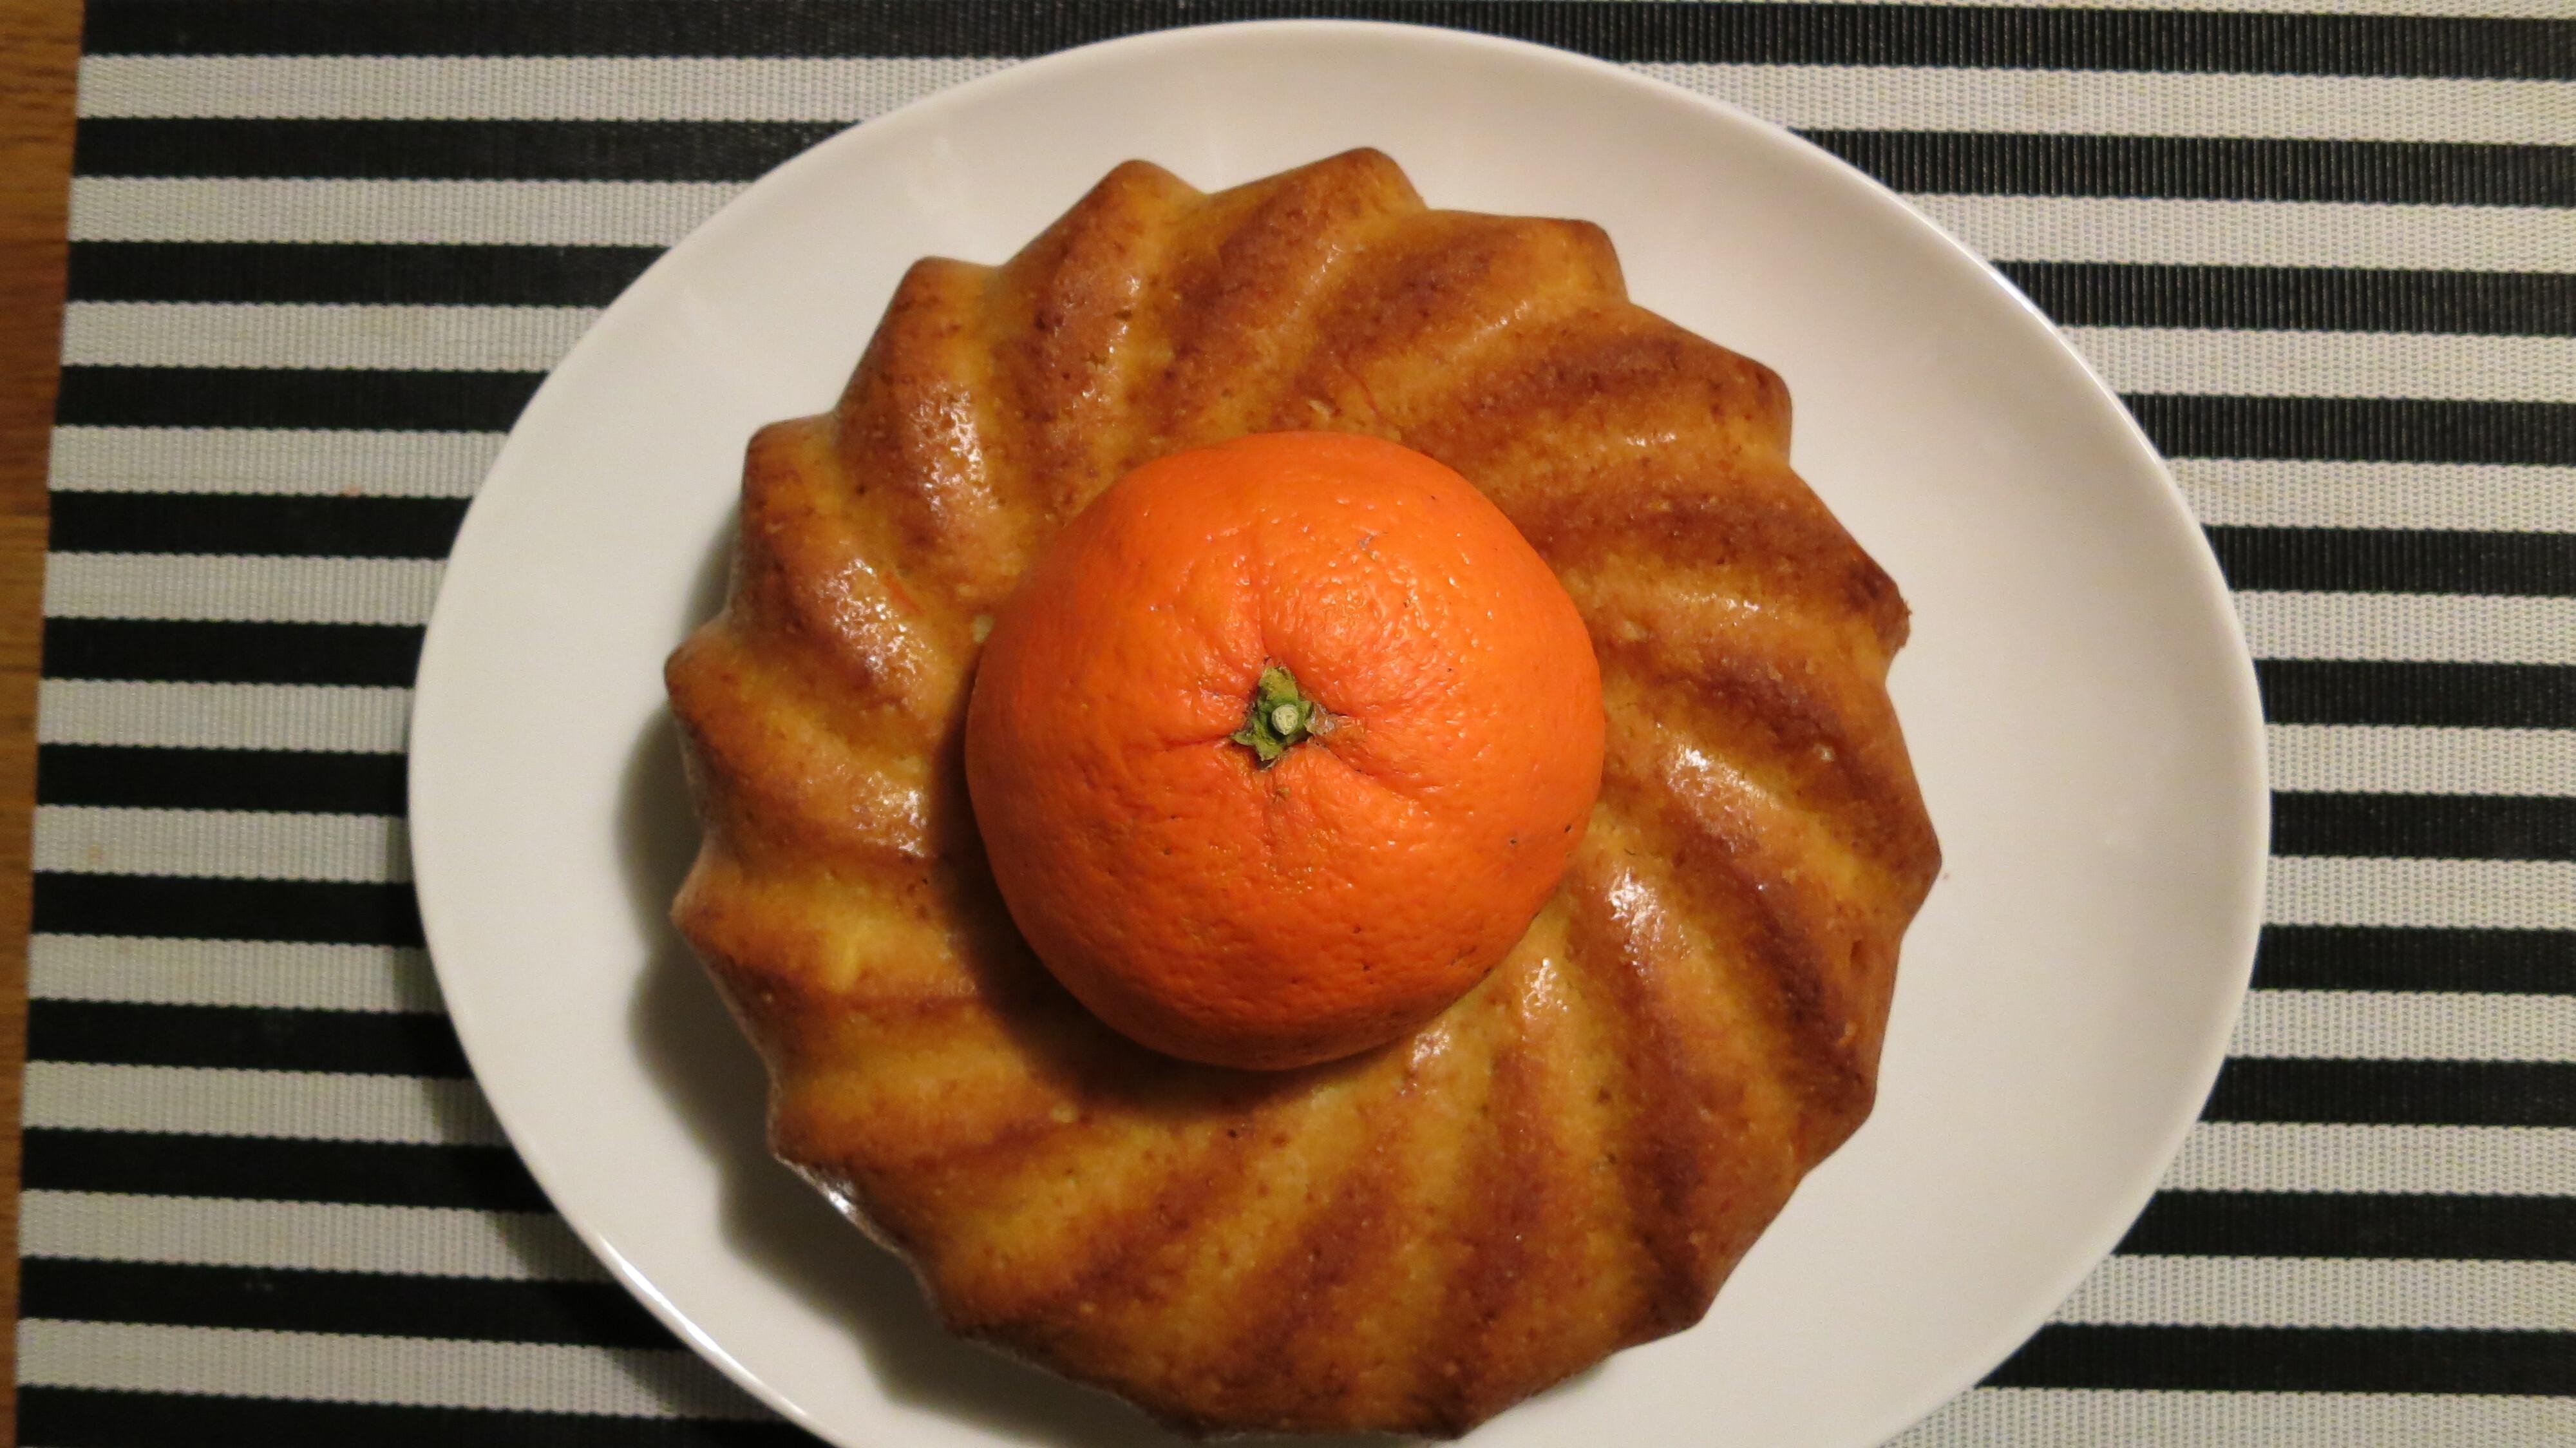 mjuk apelsinkaka